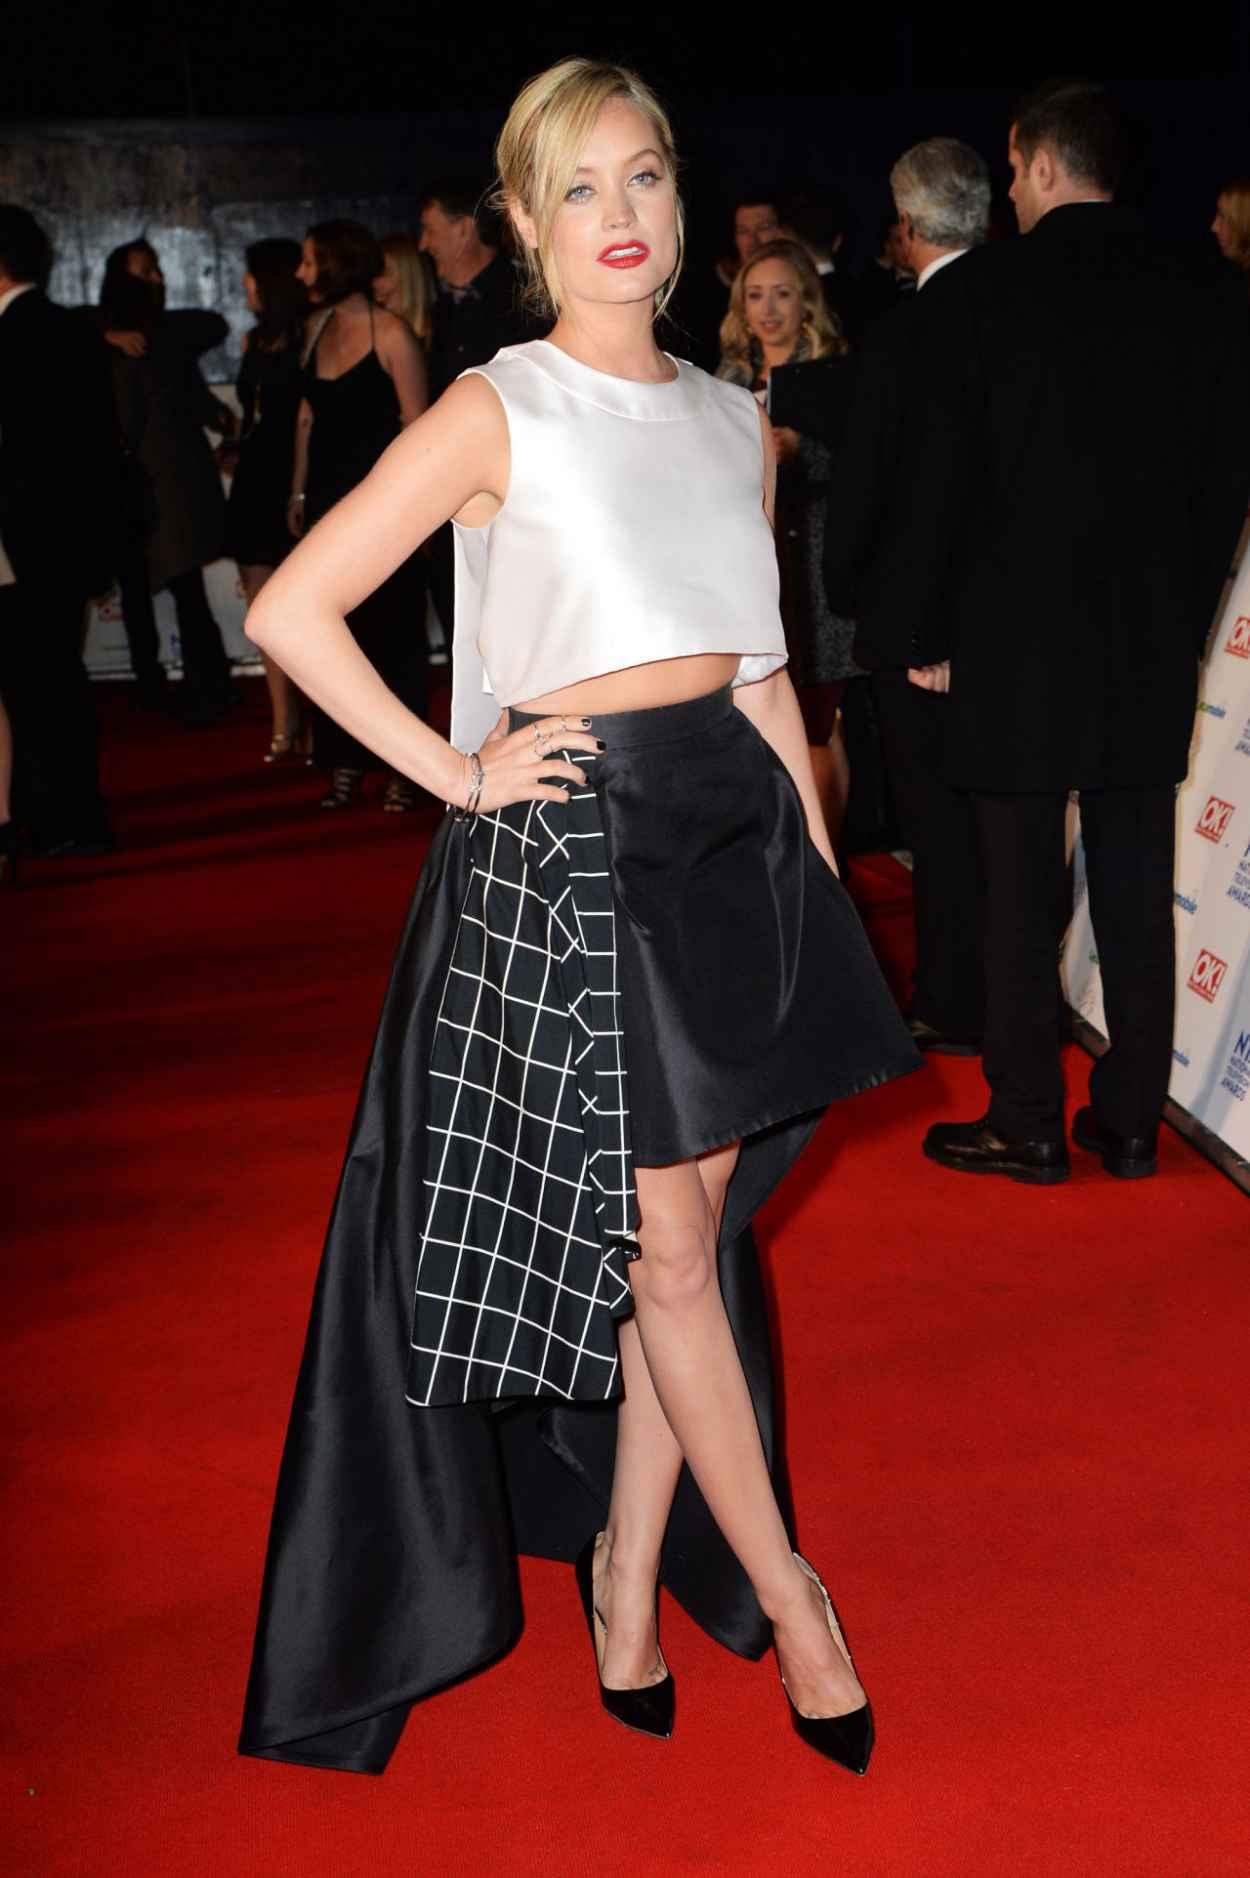 Laura Whitmore Wears LA Mania Dress at National Television Awards London, January 2015-1